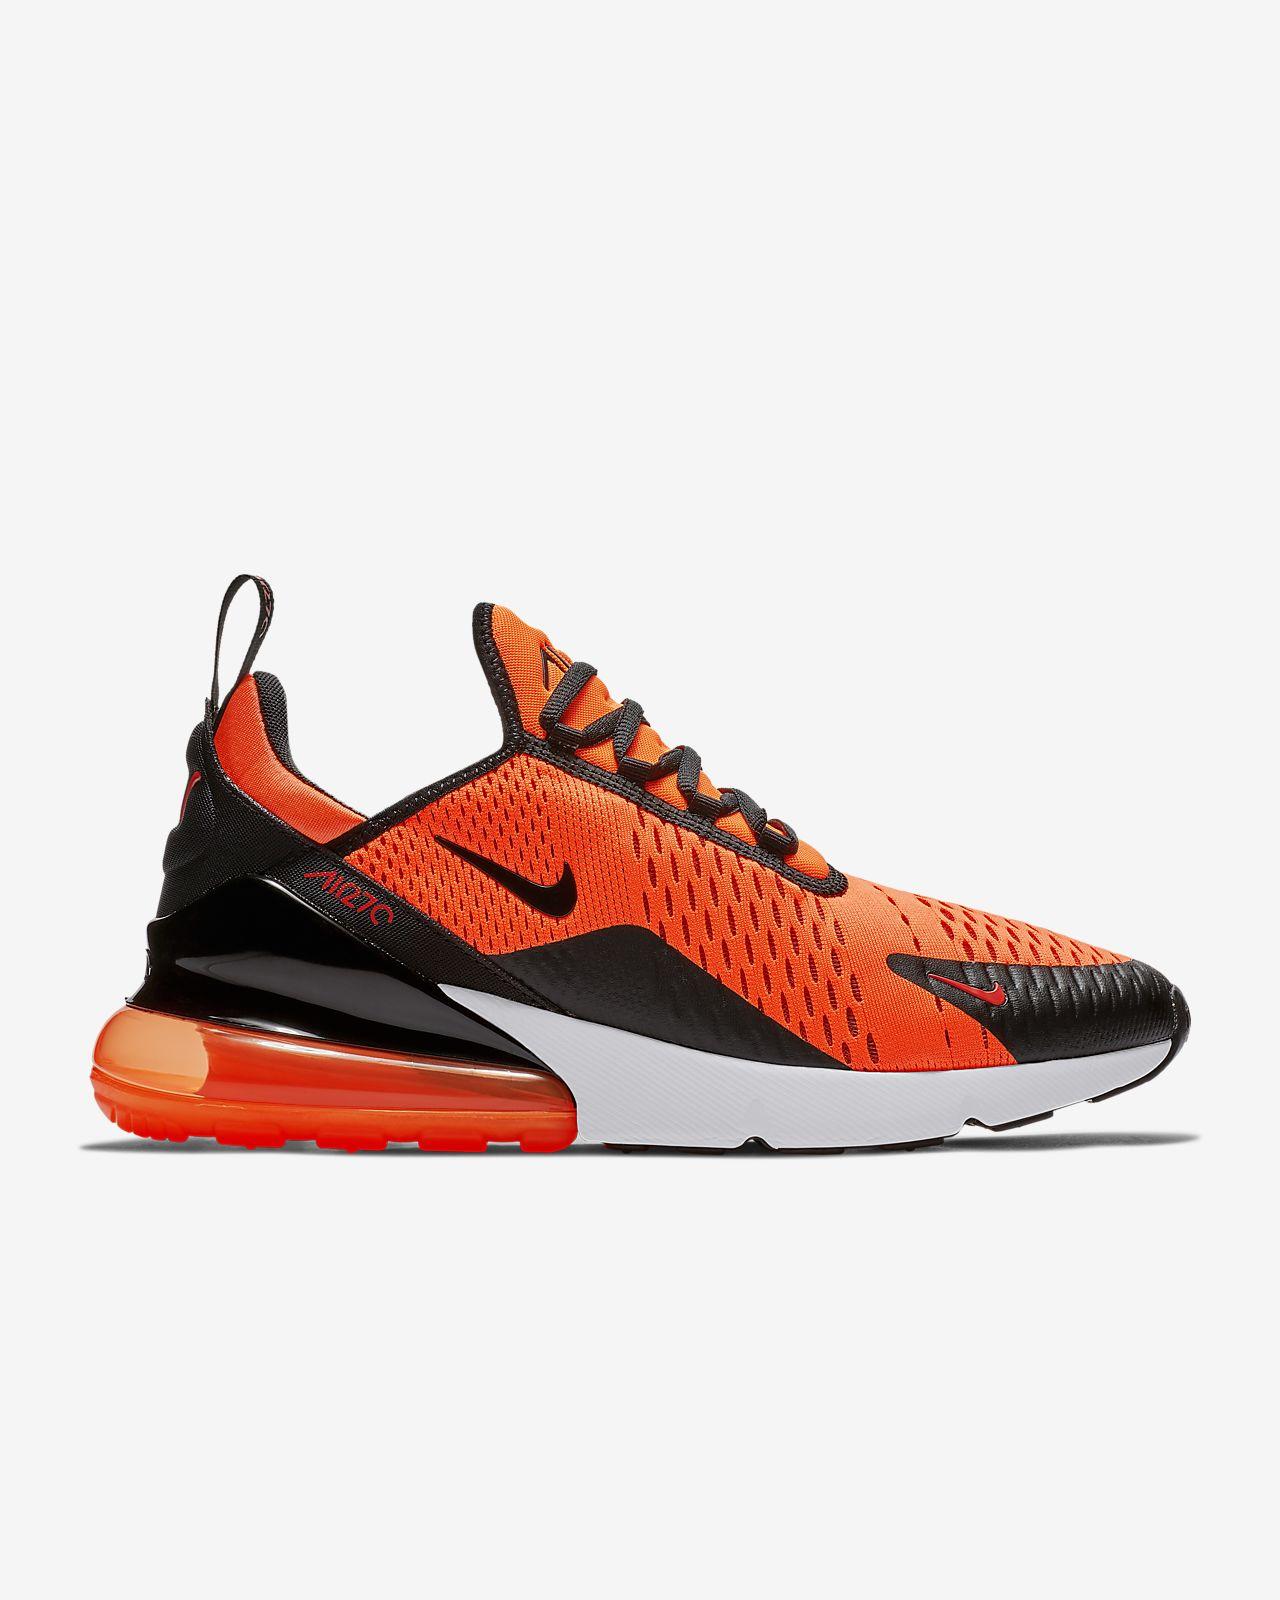 hot sale online 8f72c bffcf ... Nike Air Max 270 herresko